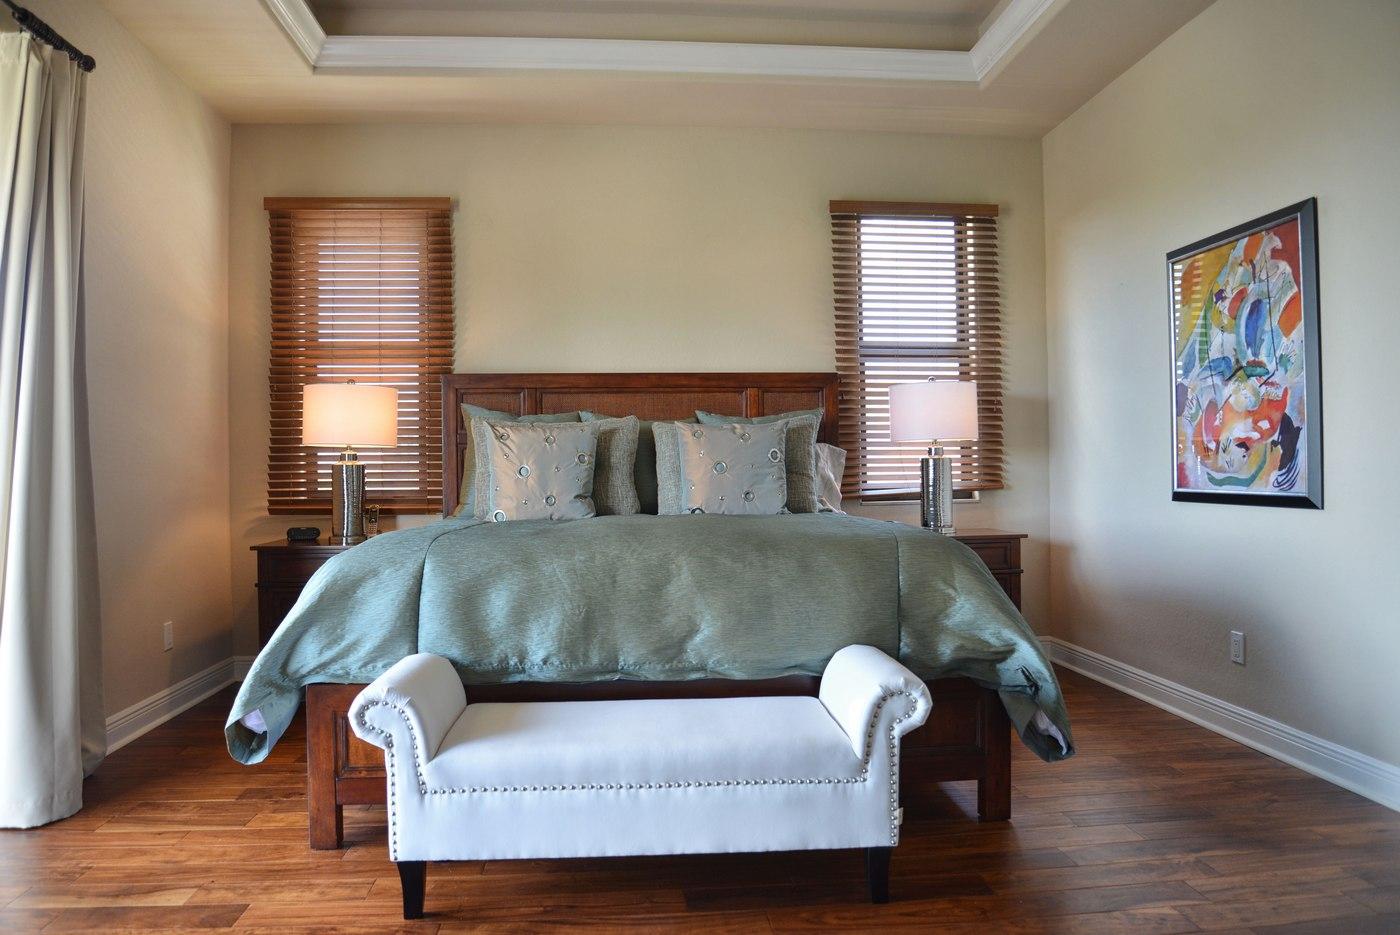 Bedroom in the rental home